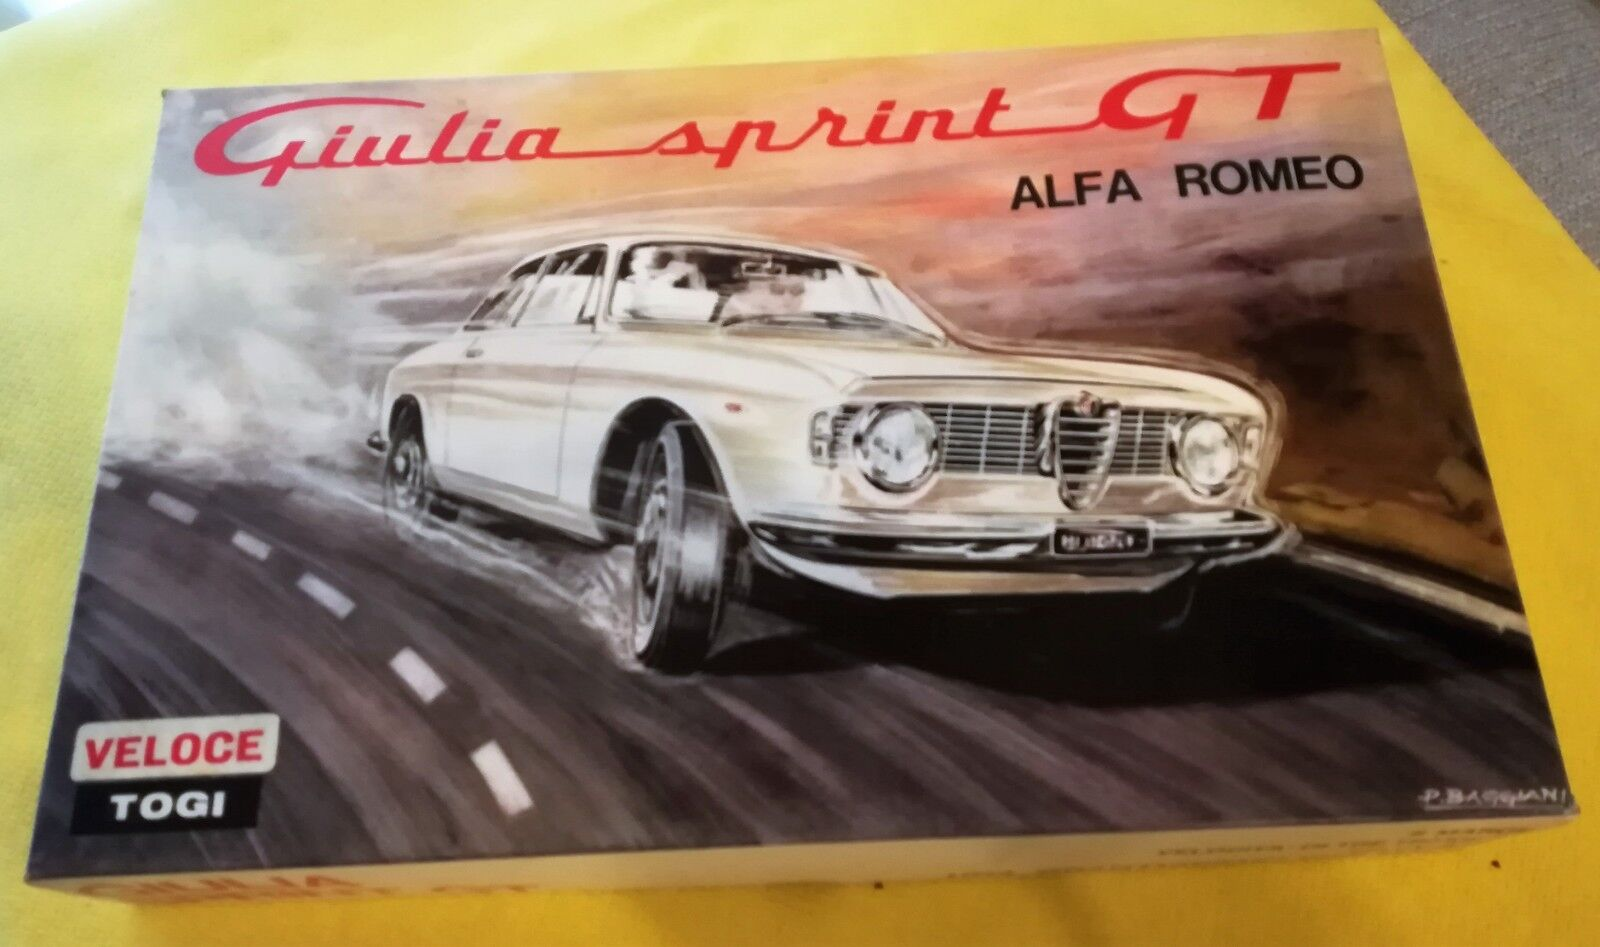 TOGI Kit (Assembled) Alfa Giulia Sprint GT Veloce 1965 Street Rojo Boxed New